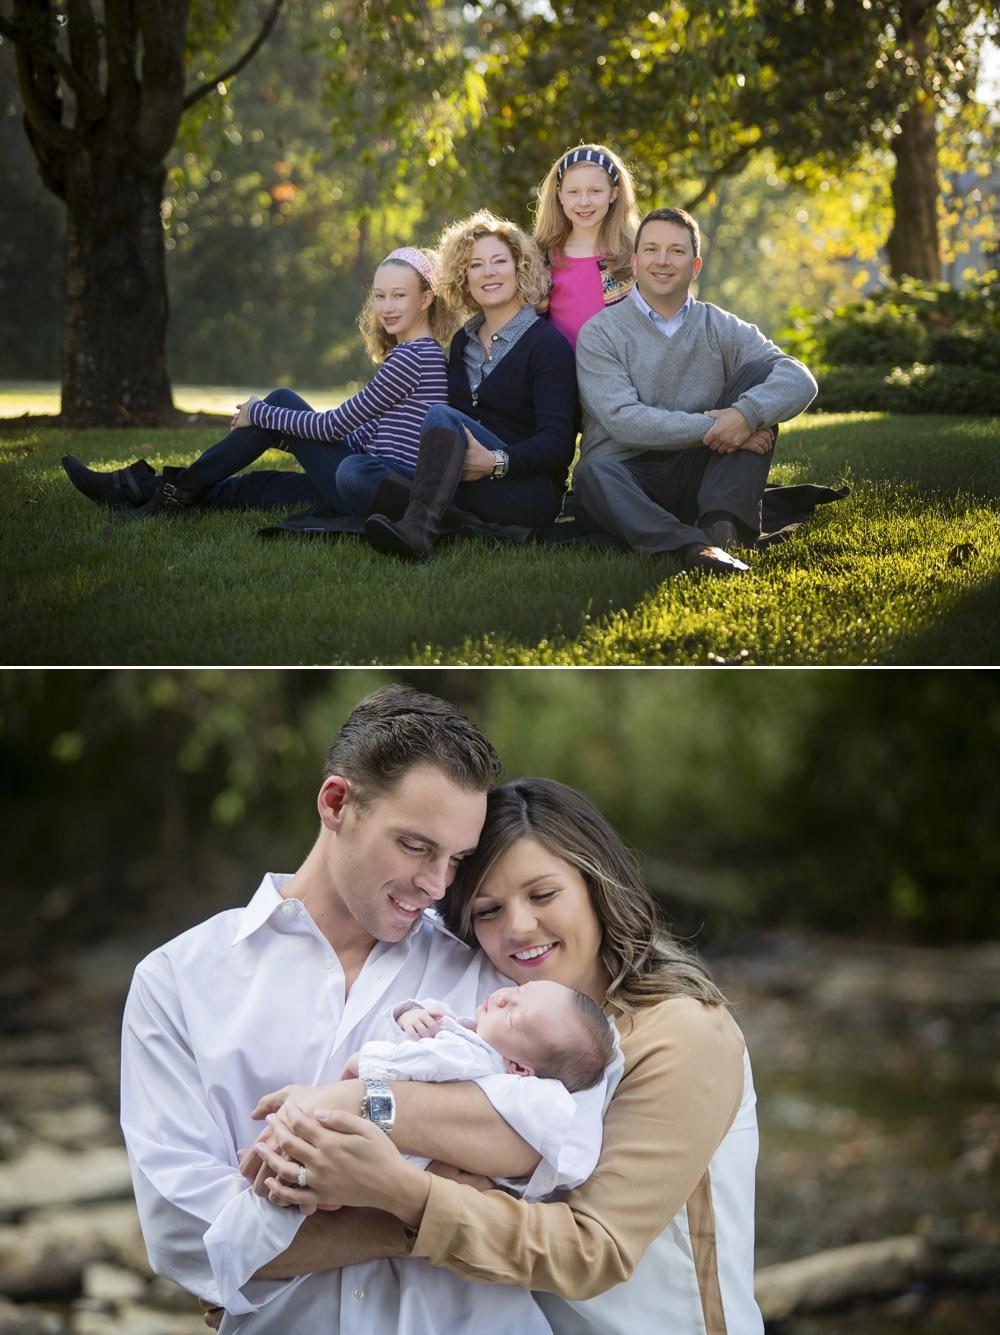 Family portrait photography Louisville